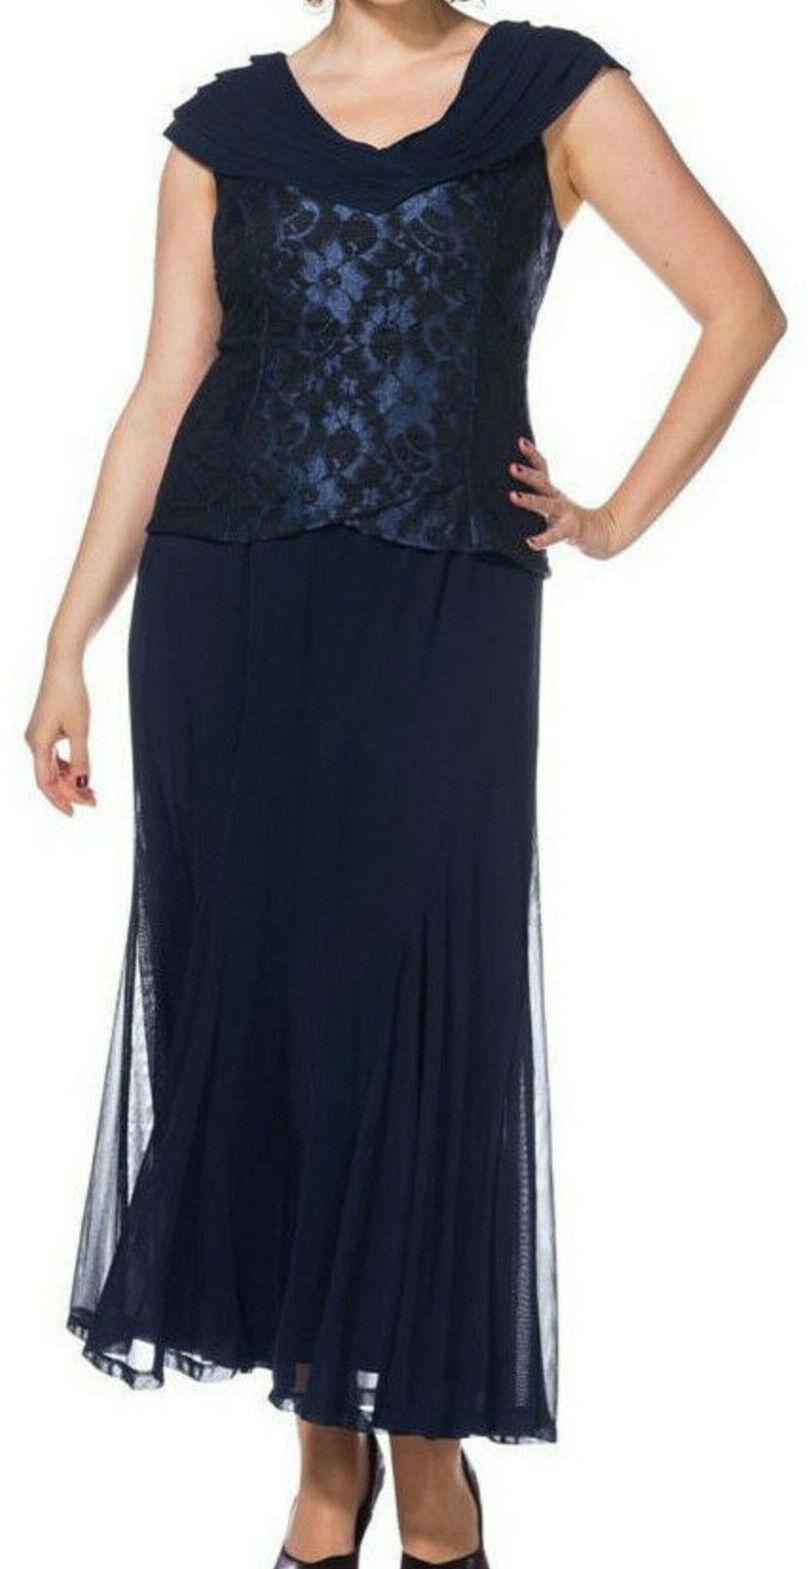 Sheego Eventkleid Abendkleid Kleid Gr. 40 bis 58 Blau Ton (040)